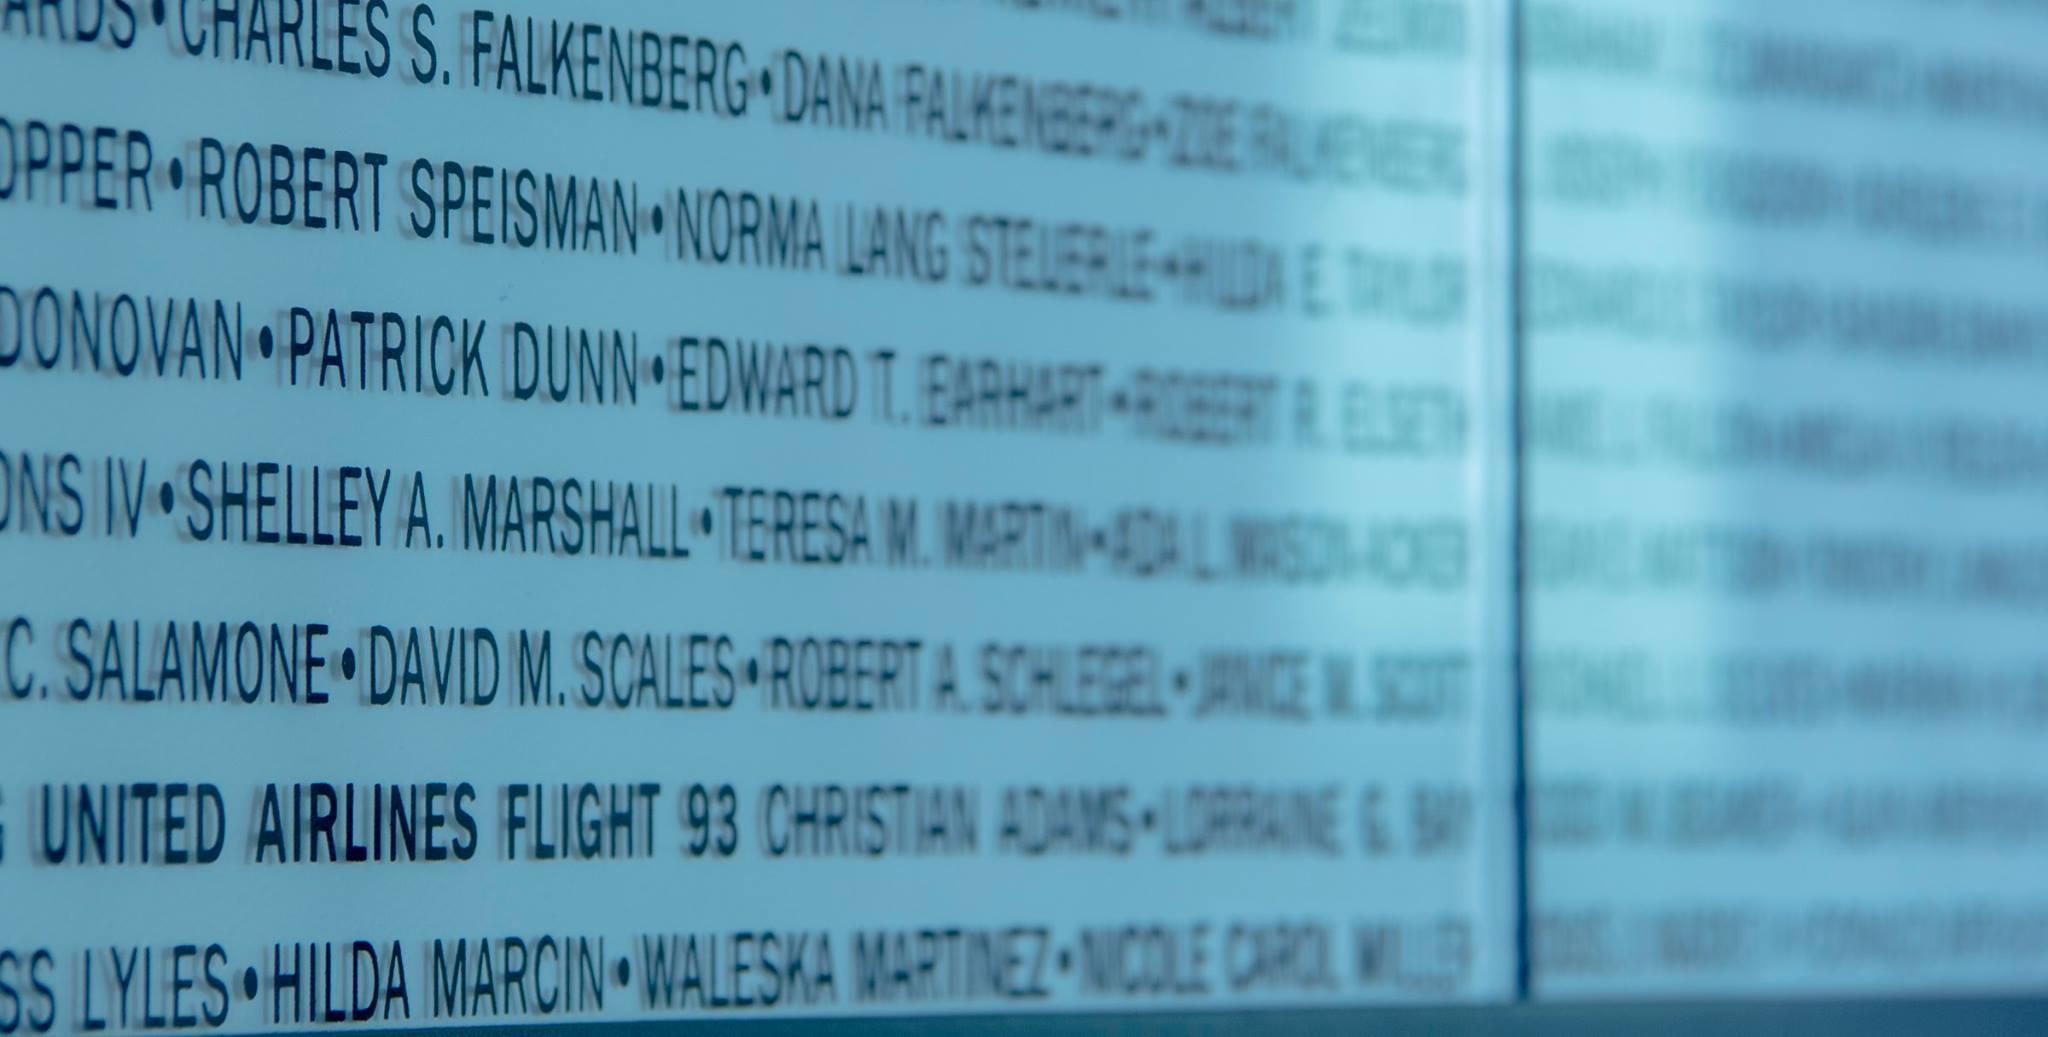 Flight 93 Memorial Remembrance Wall